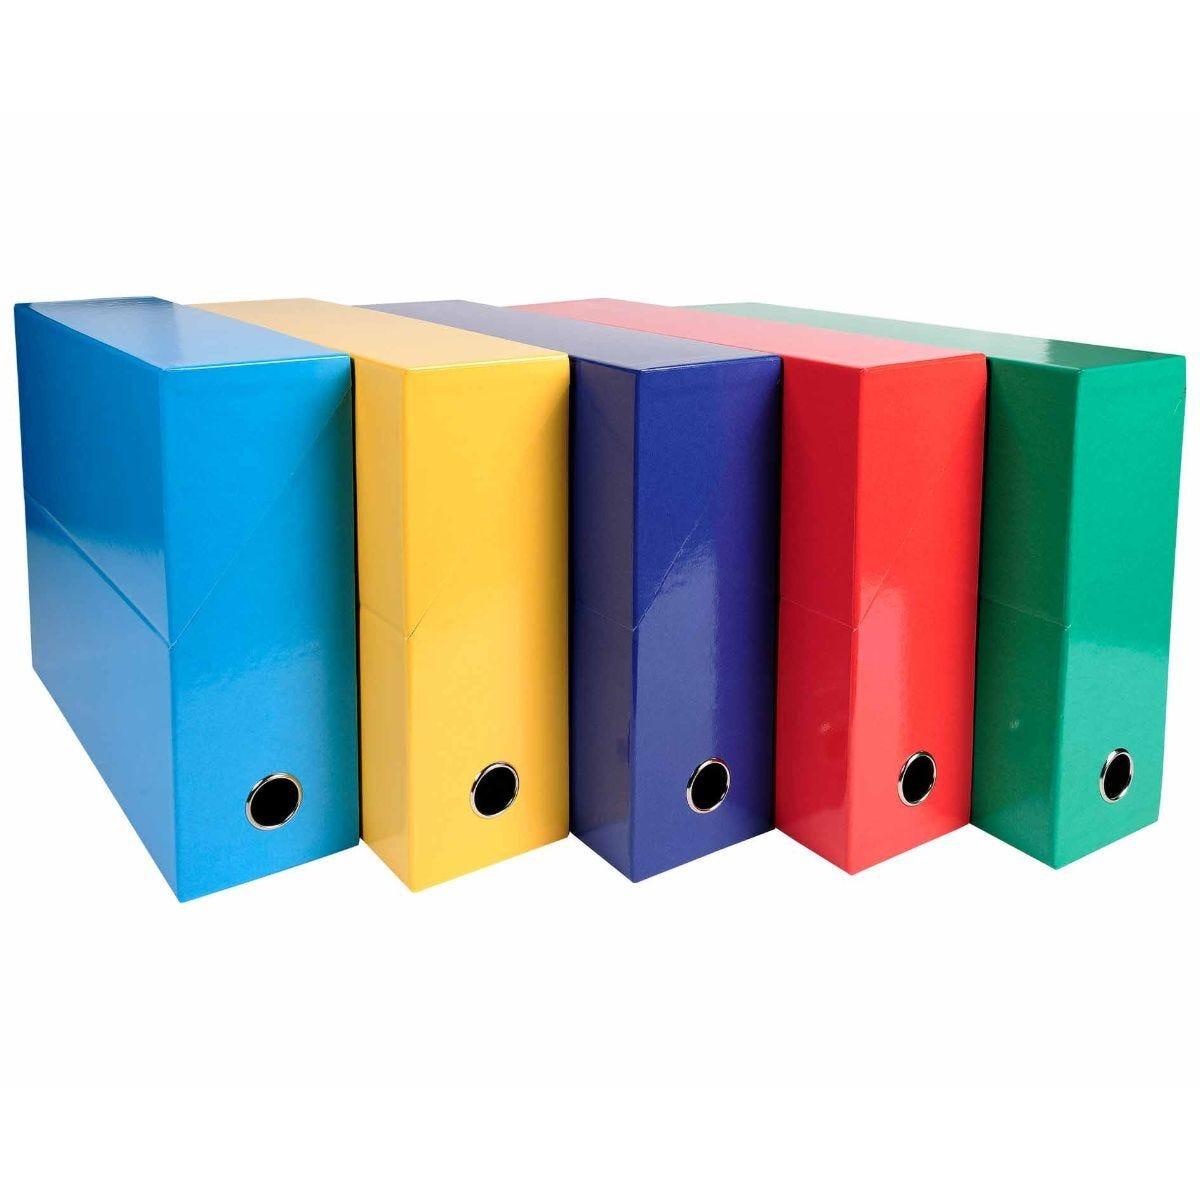 Exacompta Iderama Filing Box 90mm Pack of 5 Assorted